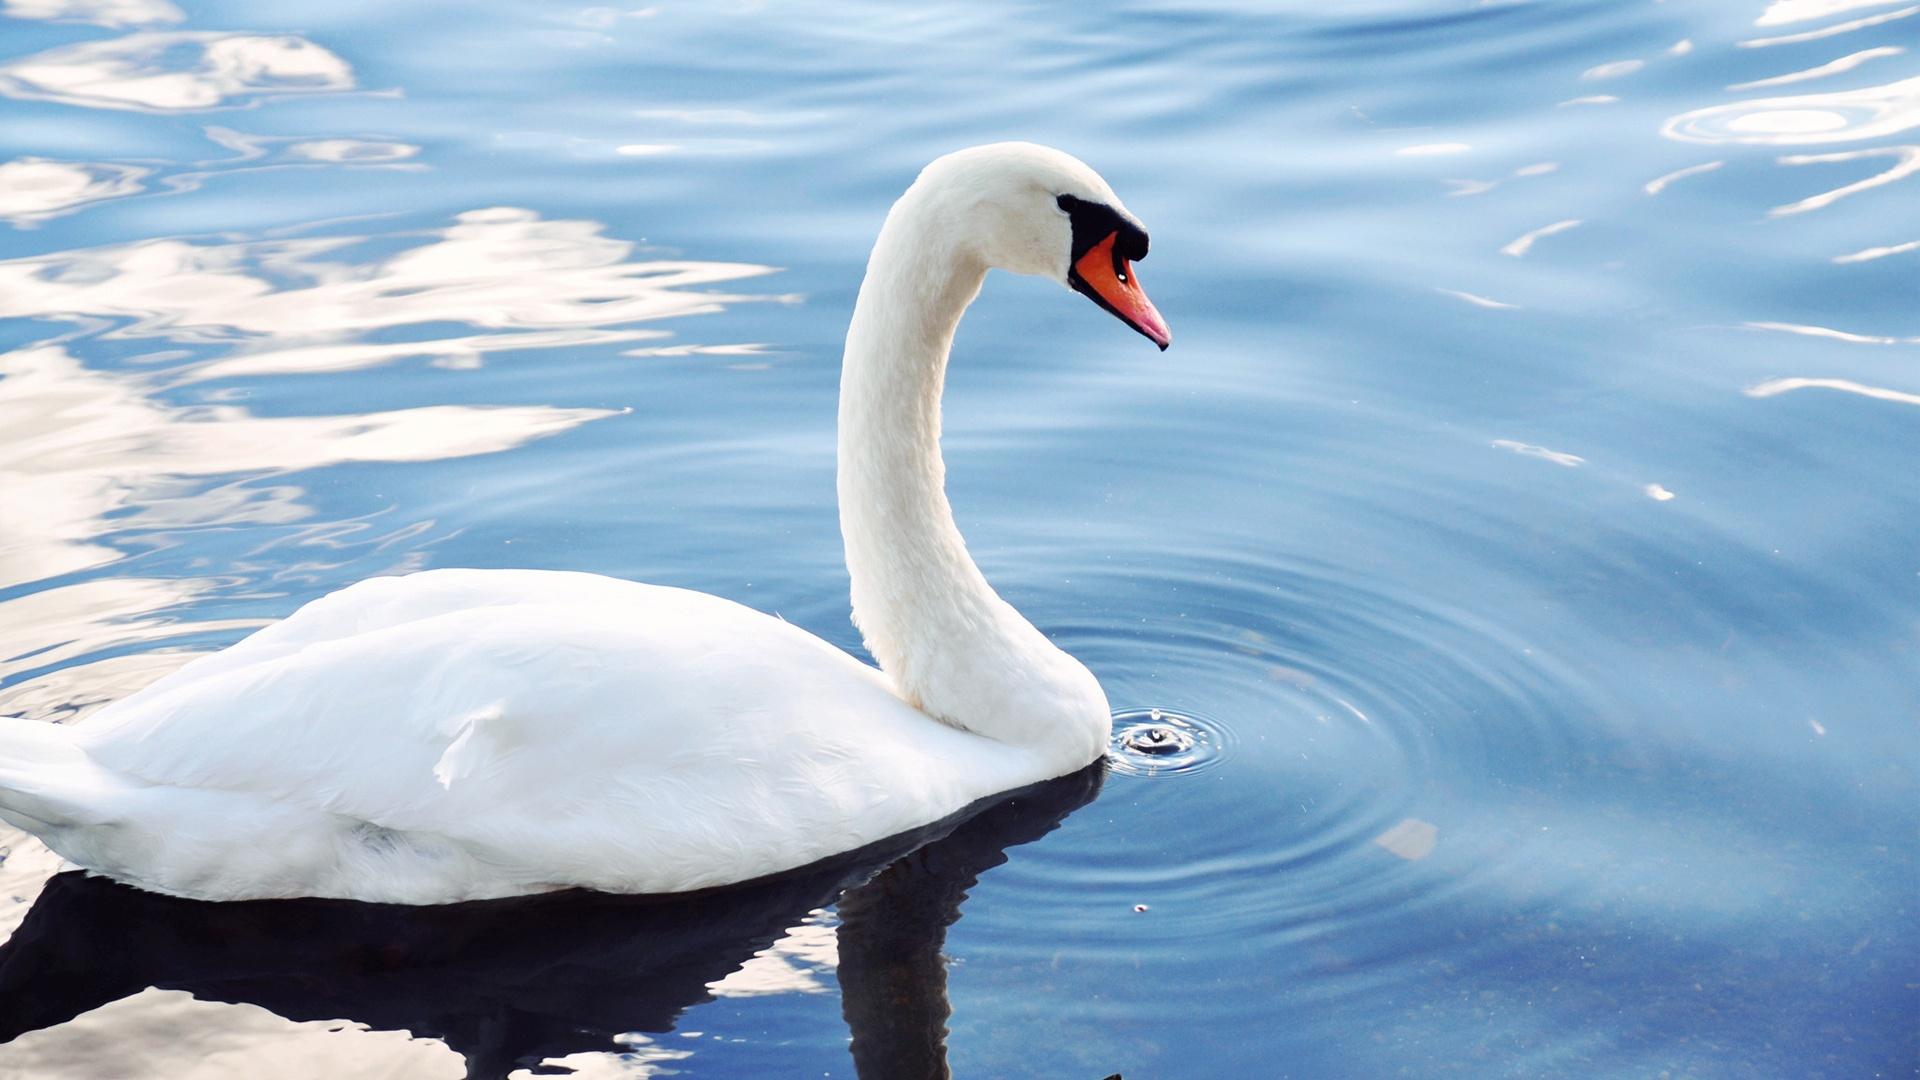 White Swan Bird Pond Animals Wallpapers